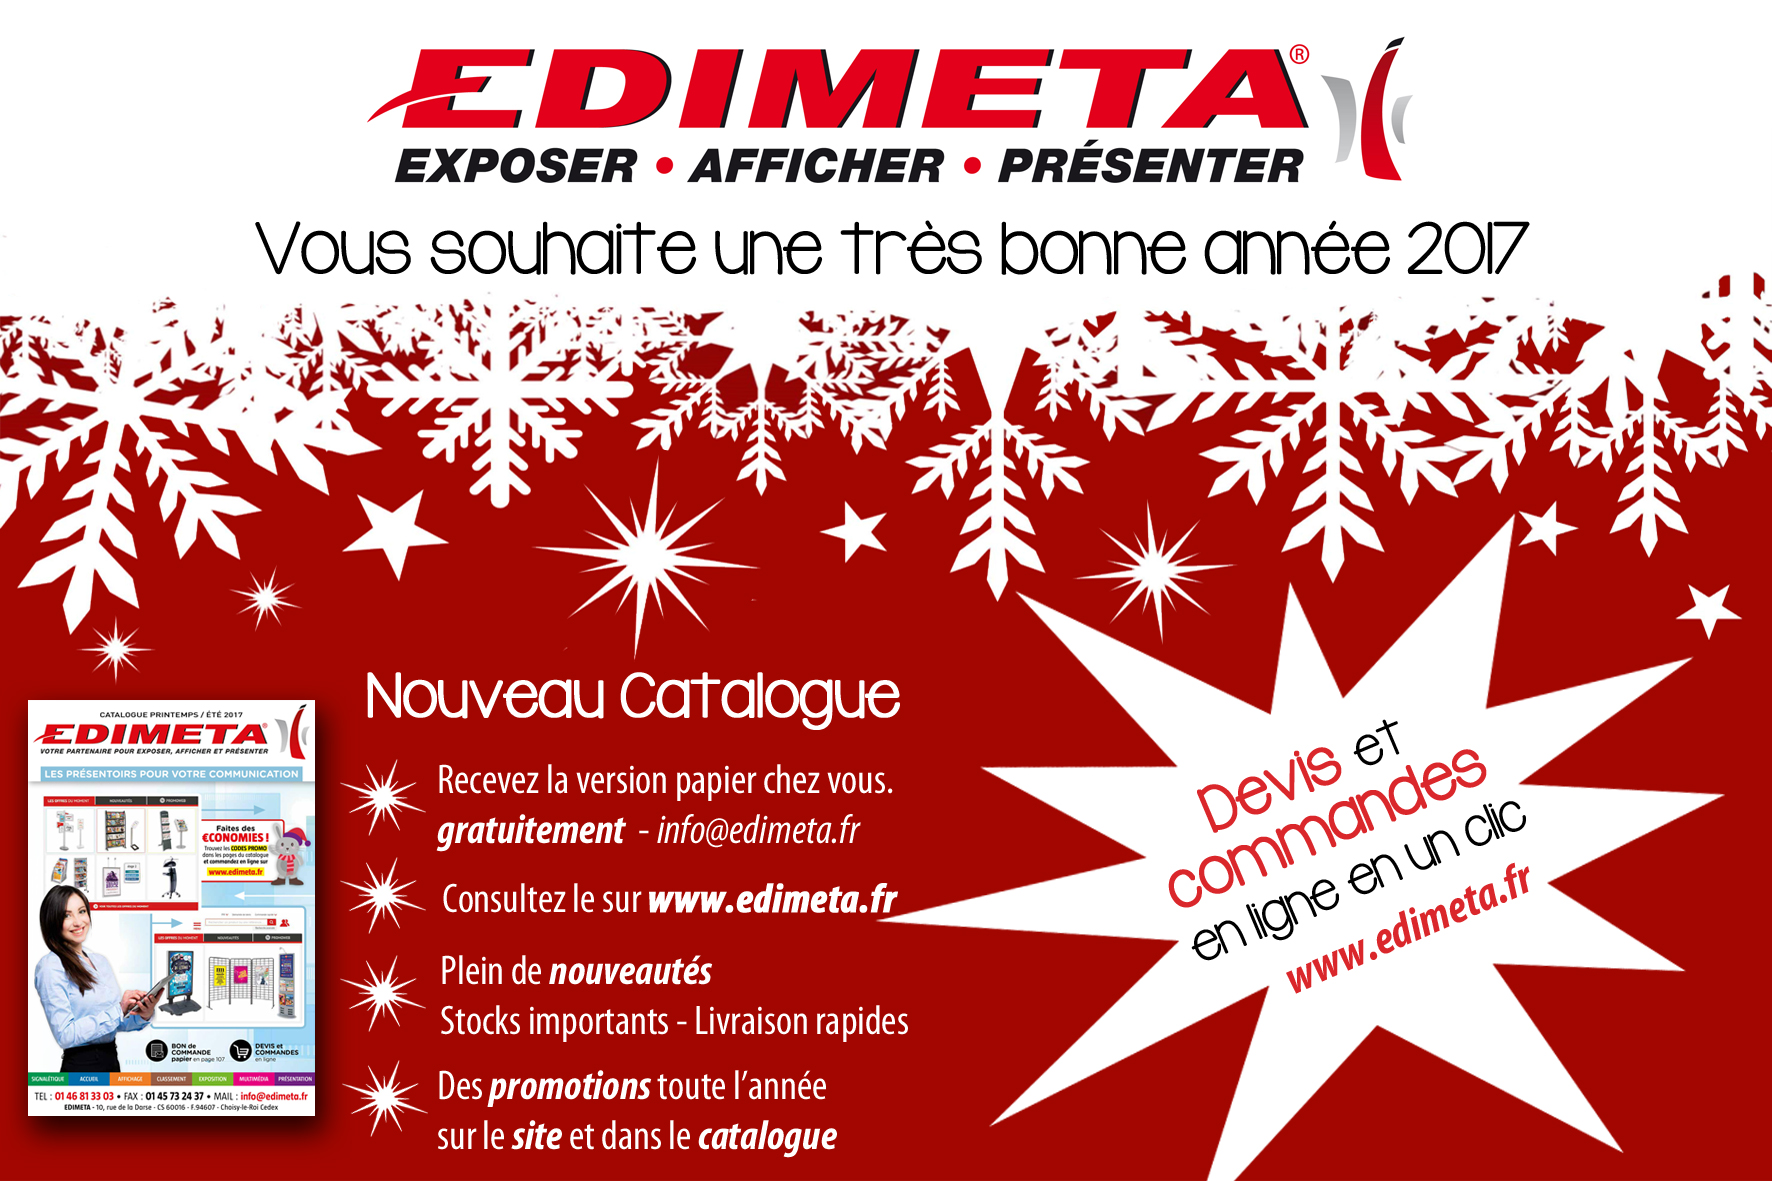 EDIMETA - Nouveau catalogue 2017